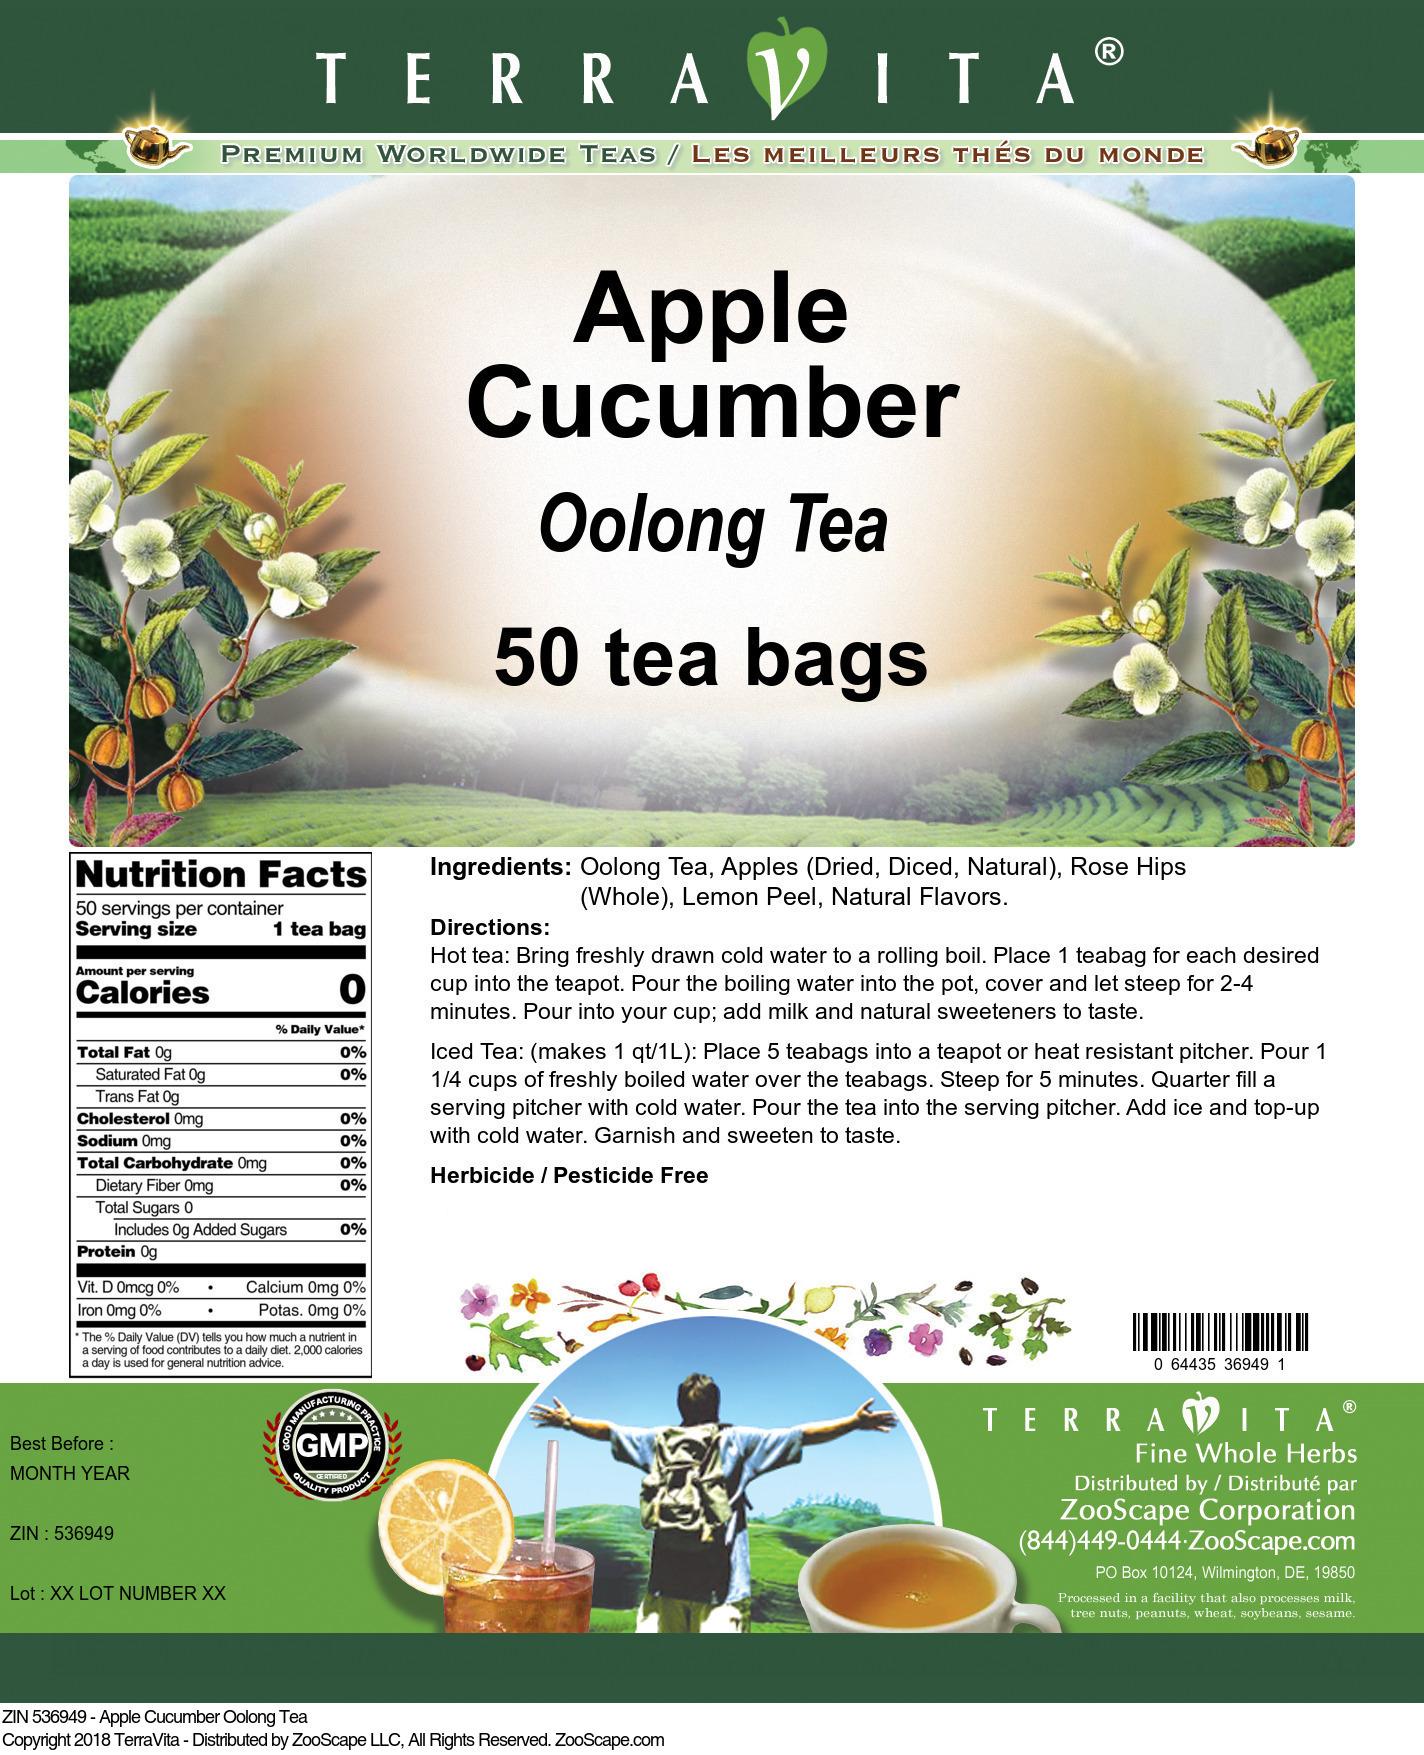 Apple Cucumber Oolong Tea